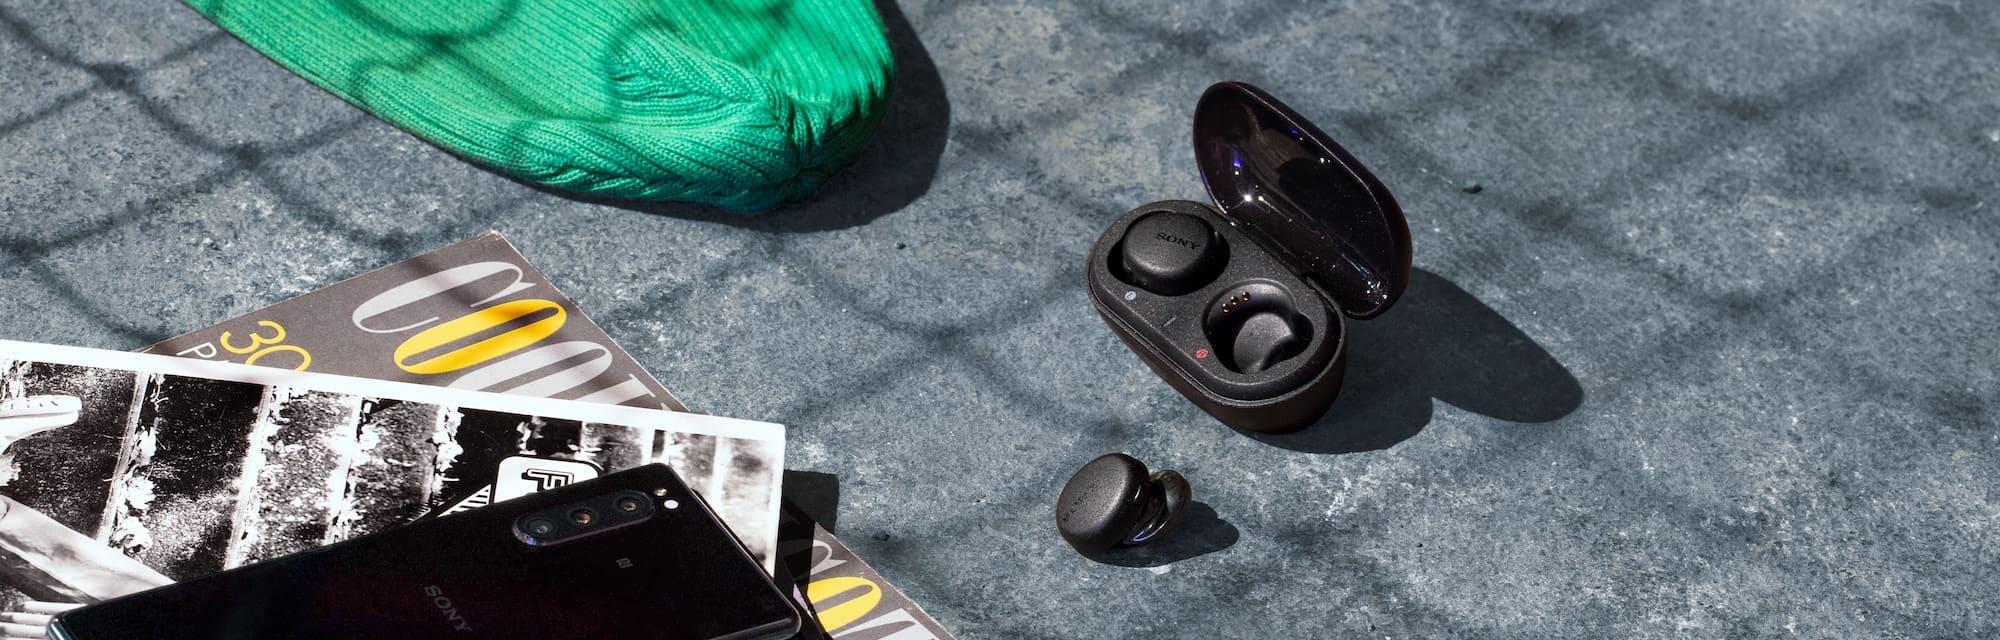 Sony WF-XB700 bluetooth earphones